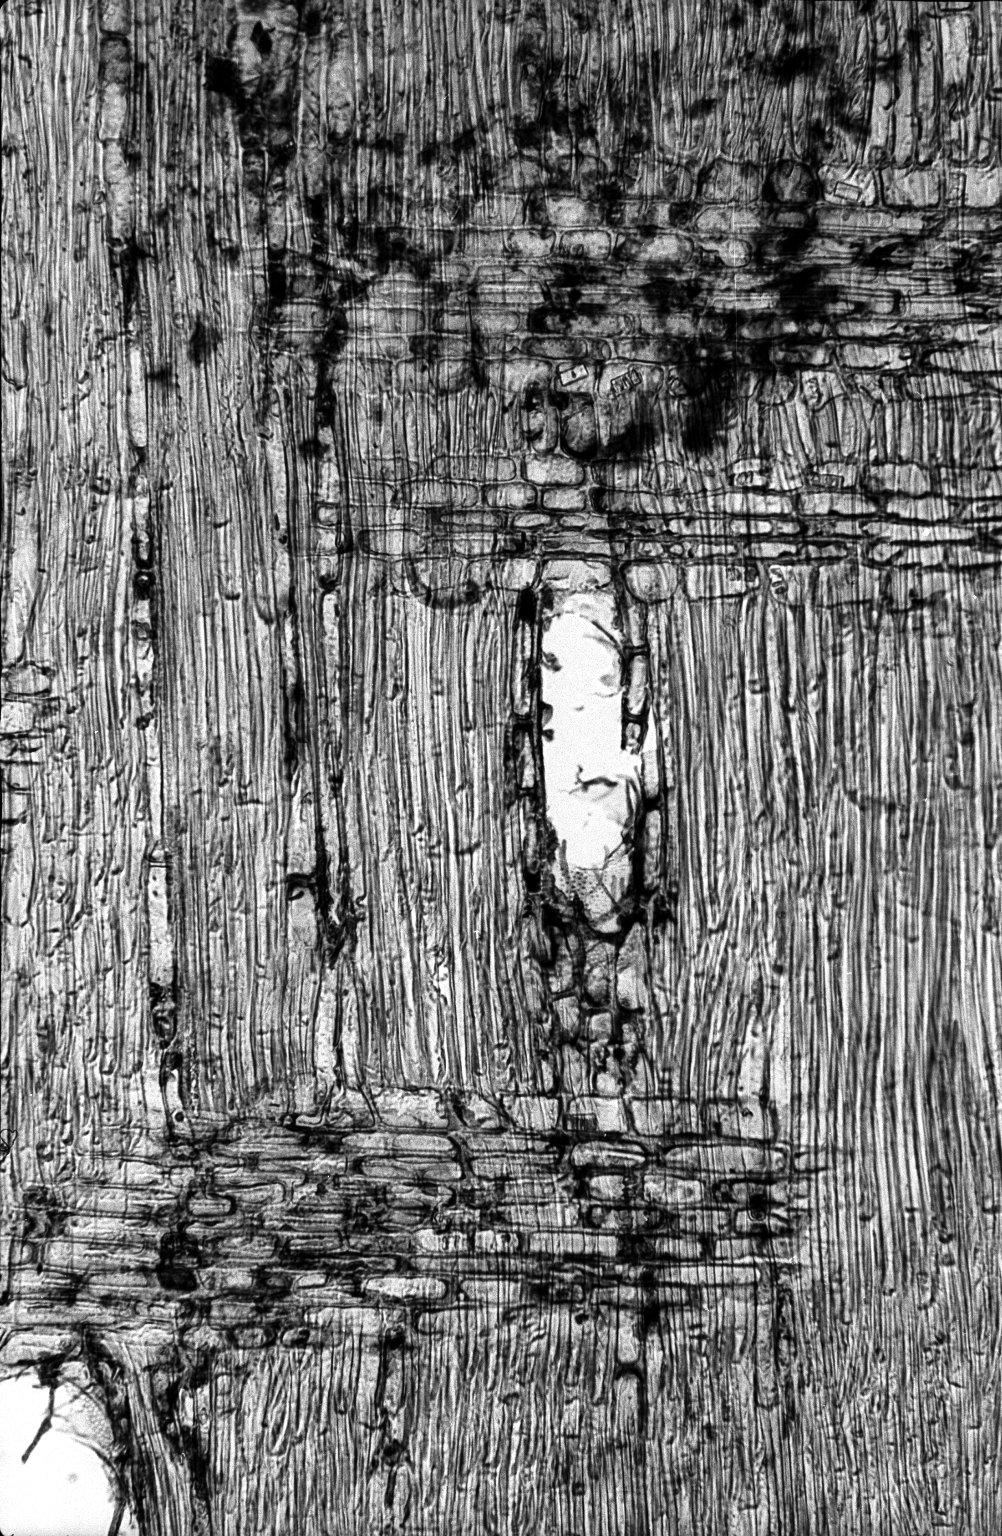 BIGNONIACEAE Markhamia zanzibarica